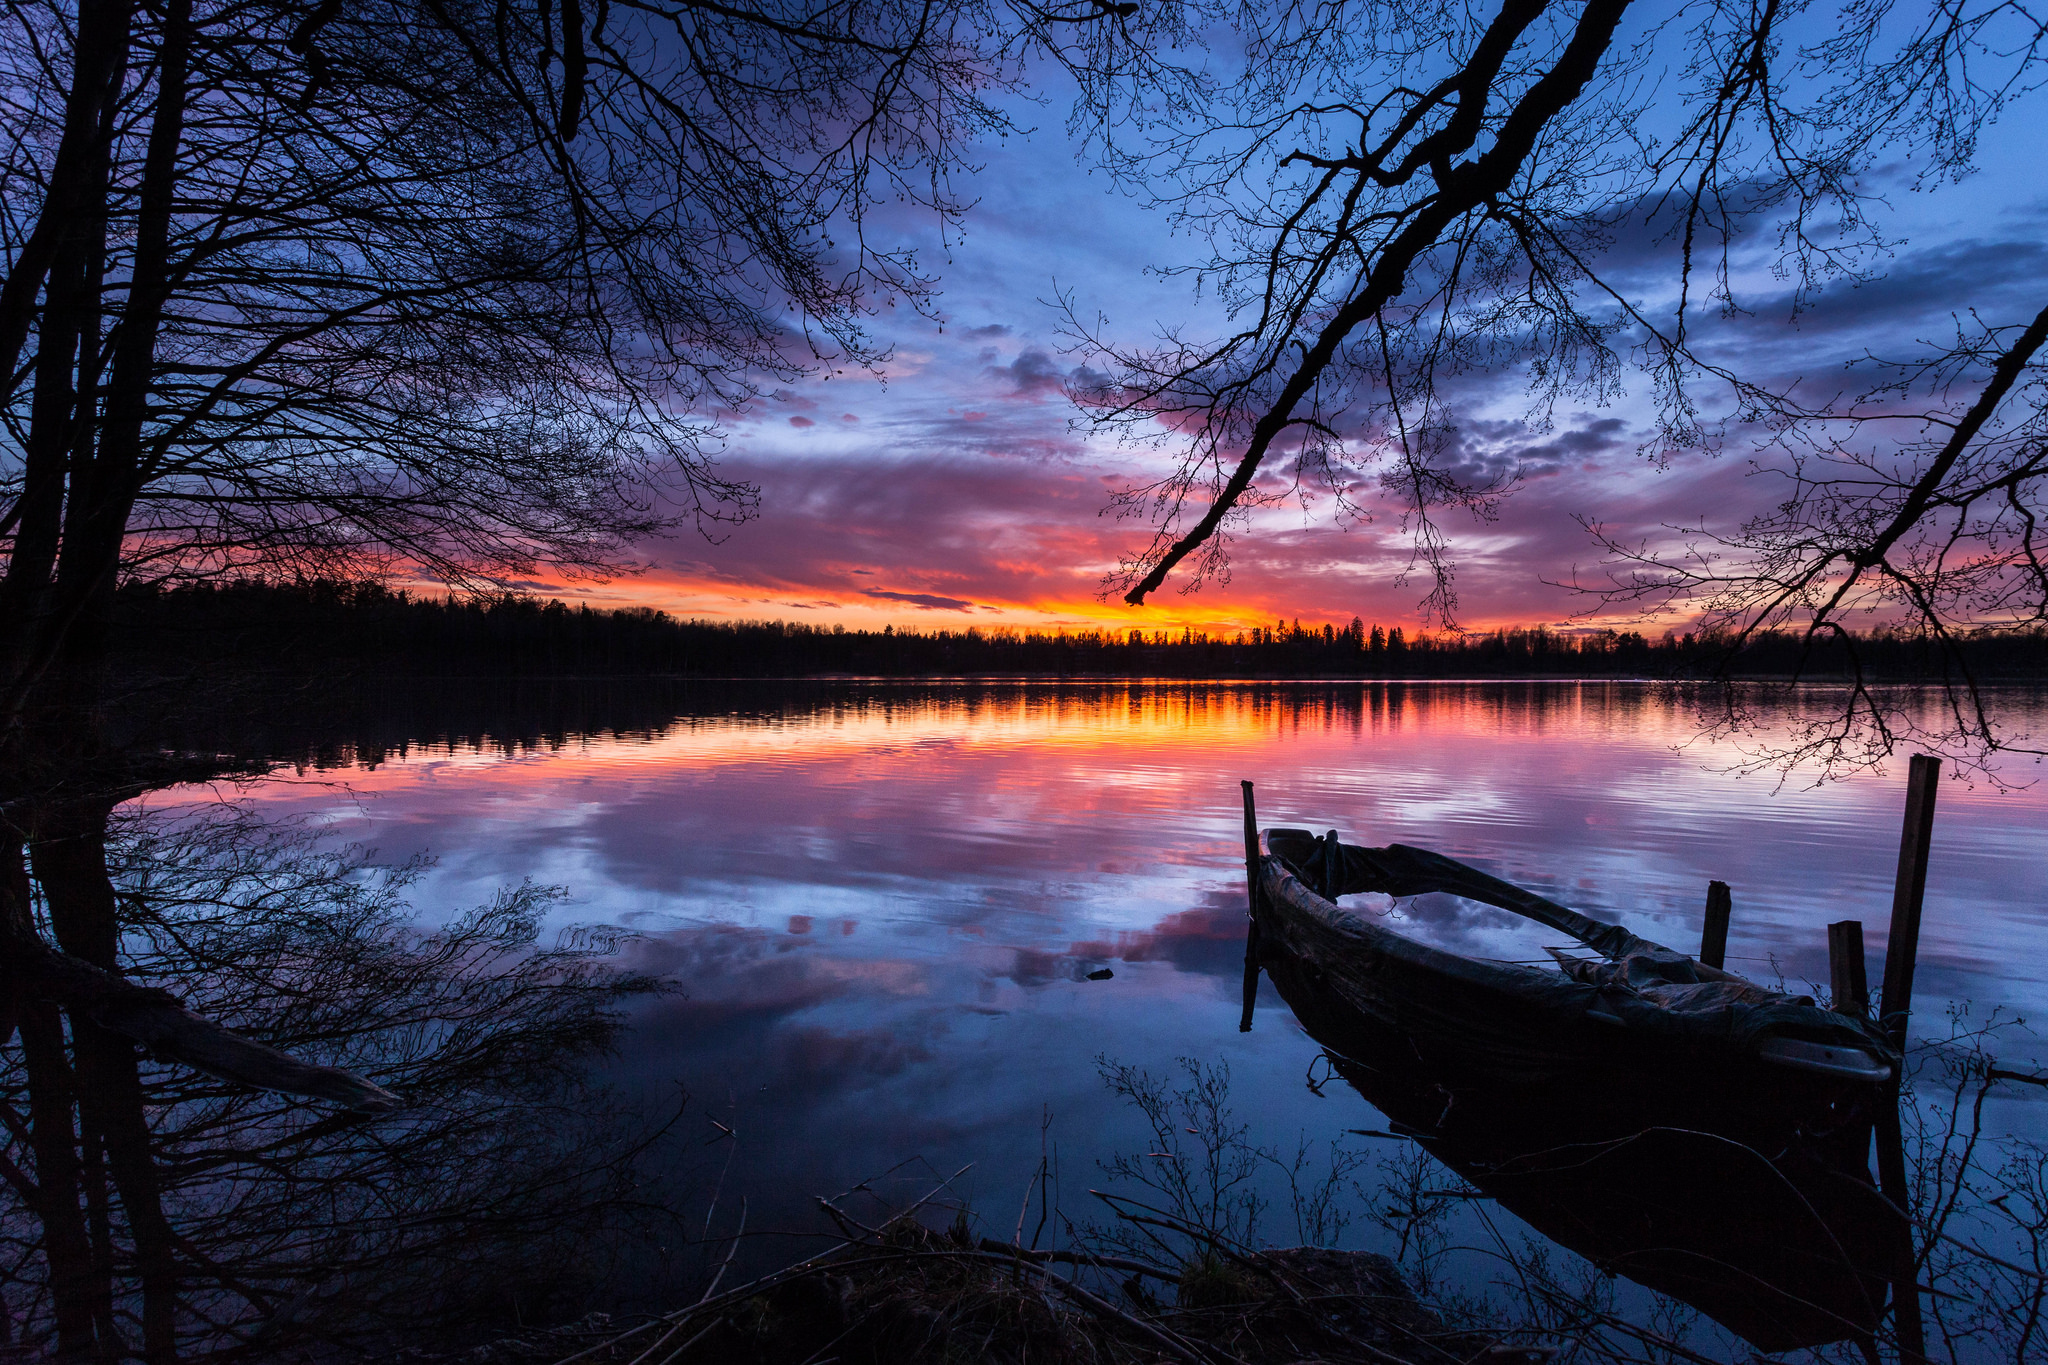 Viherlaakso, Espoo, Finland